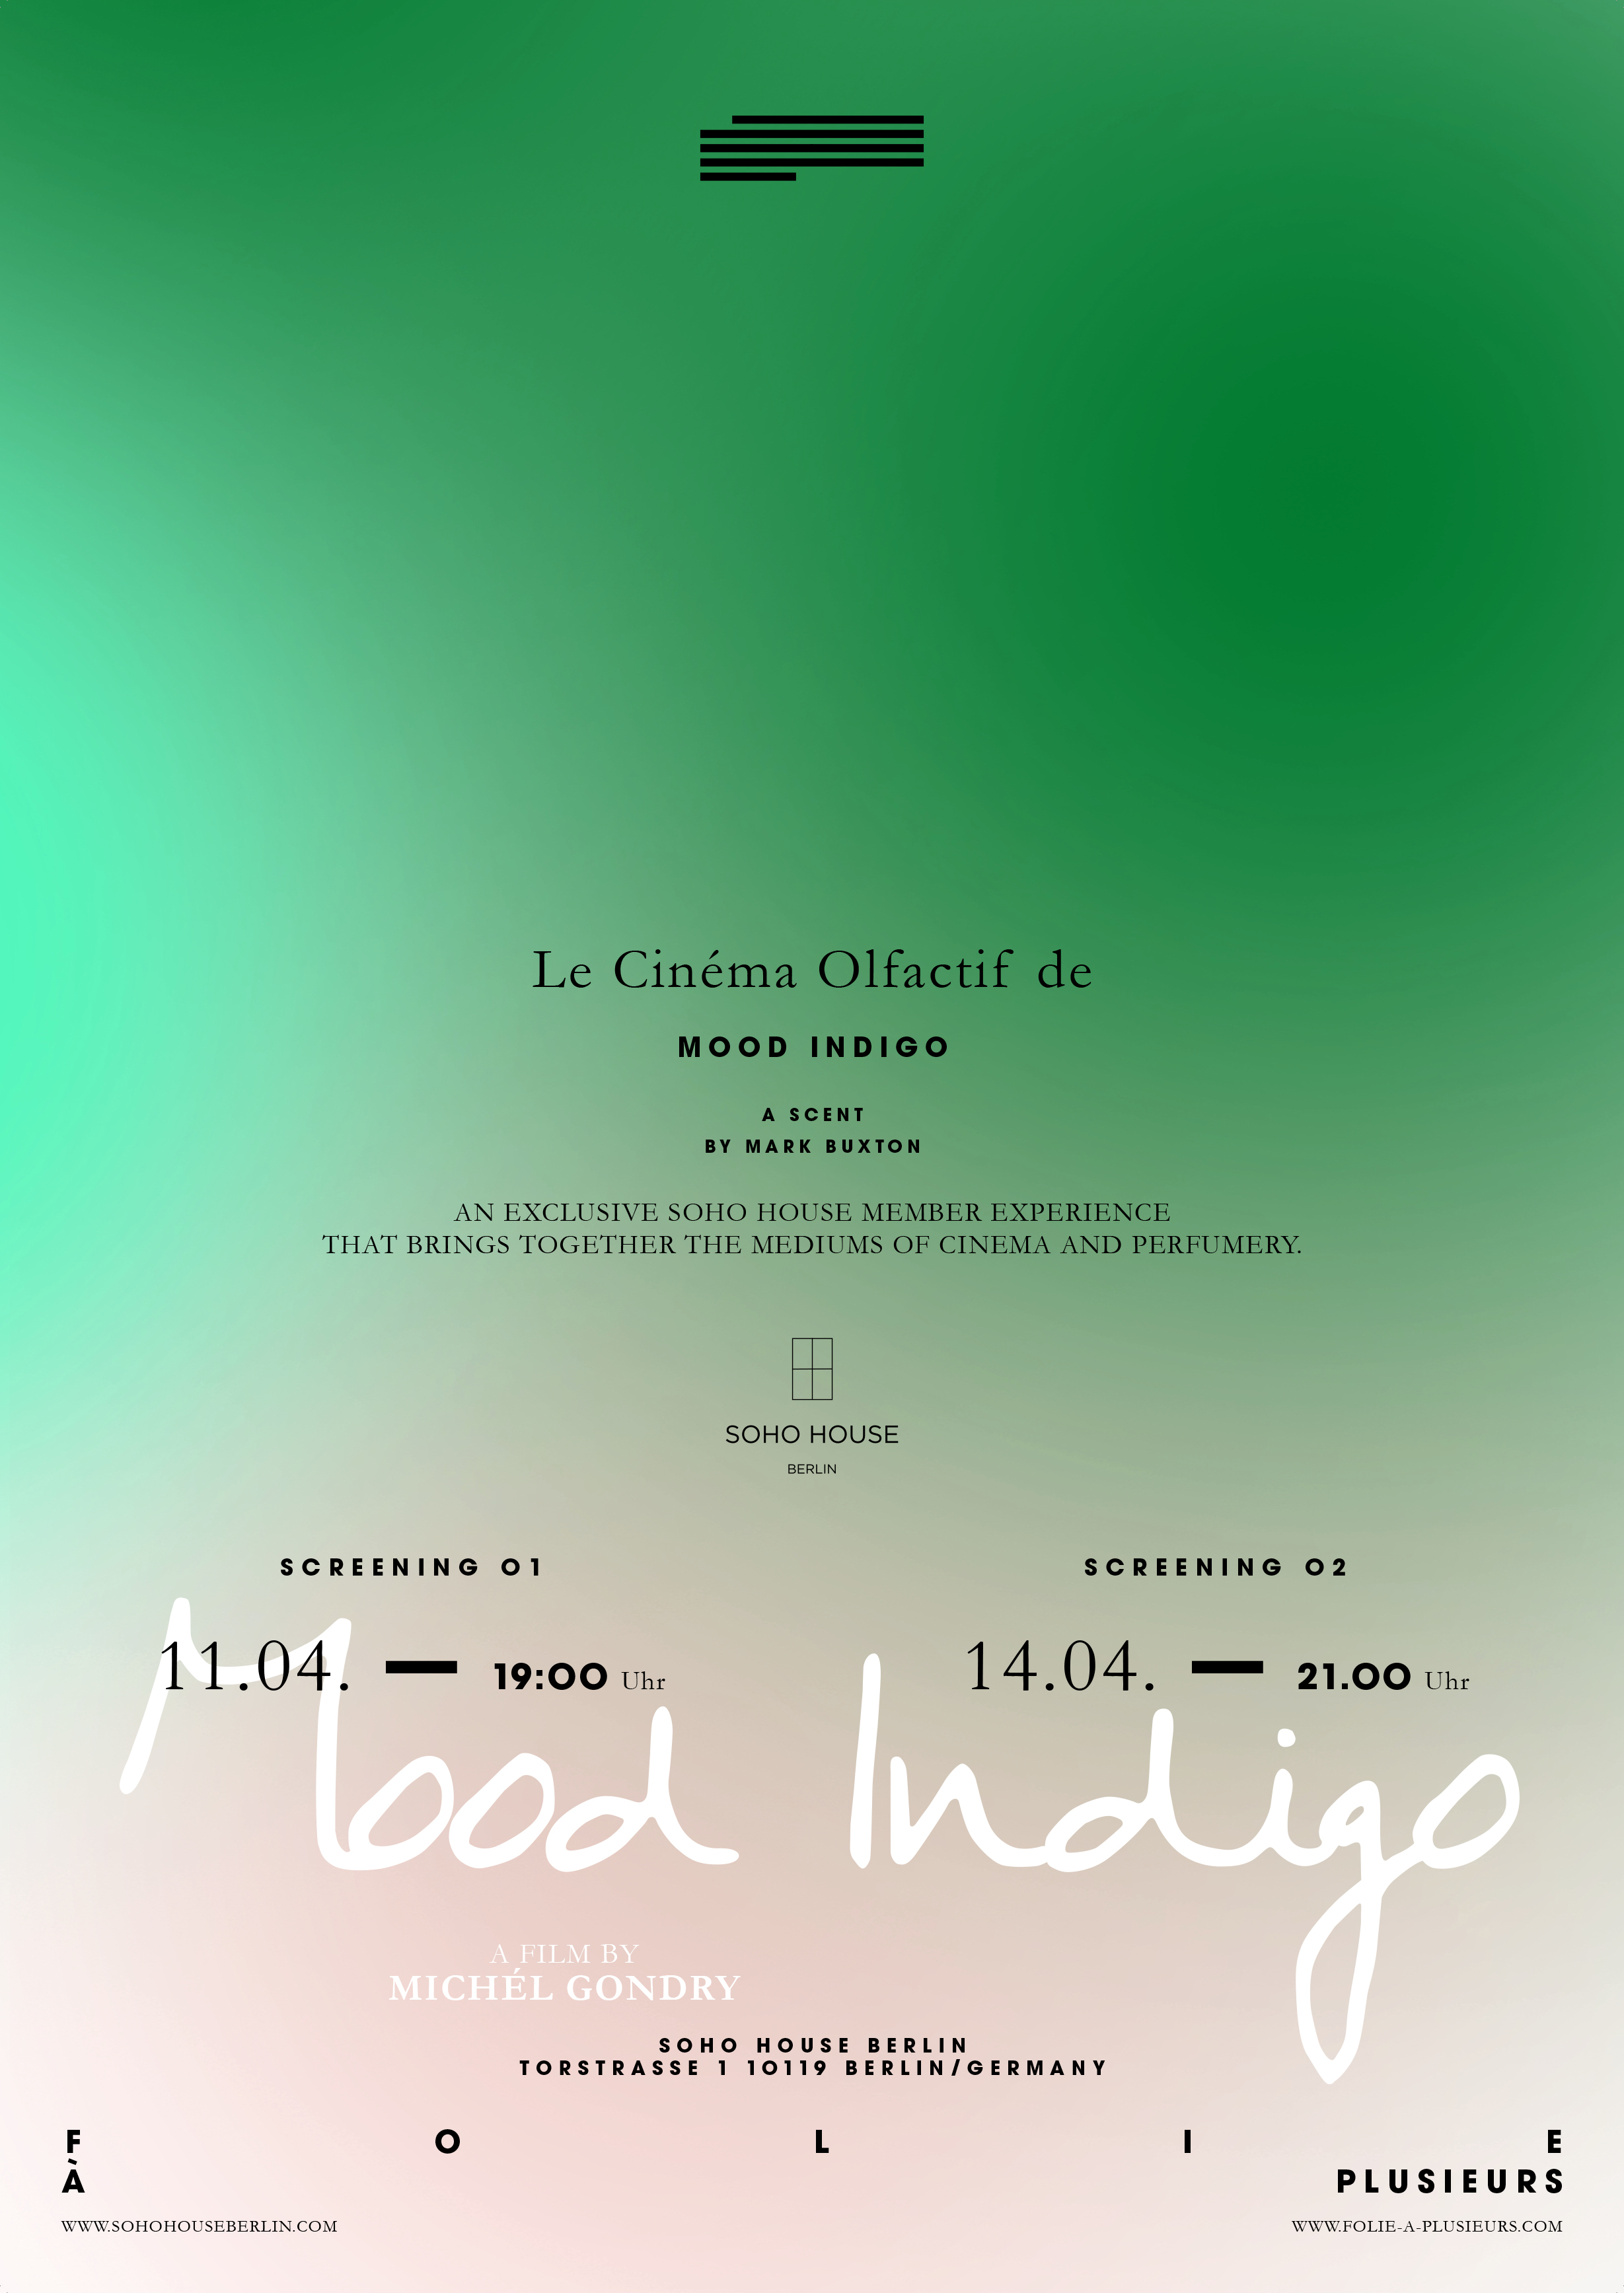 Web_MoodIndigo_Perfume_Folie-A-Plusieurs_Le_cinema_olfactif.jpg